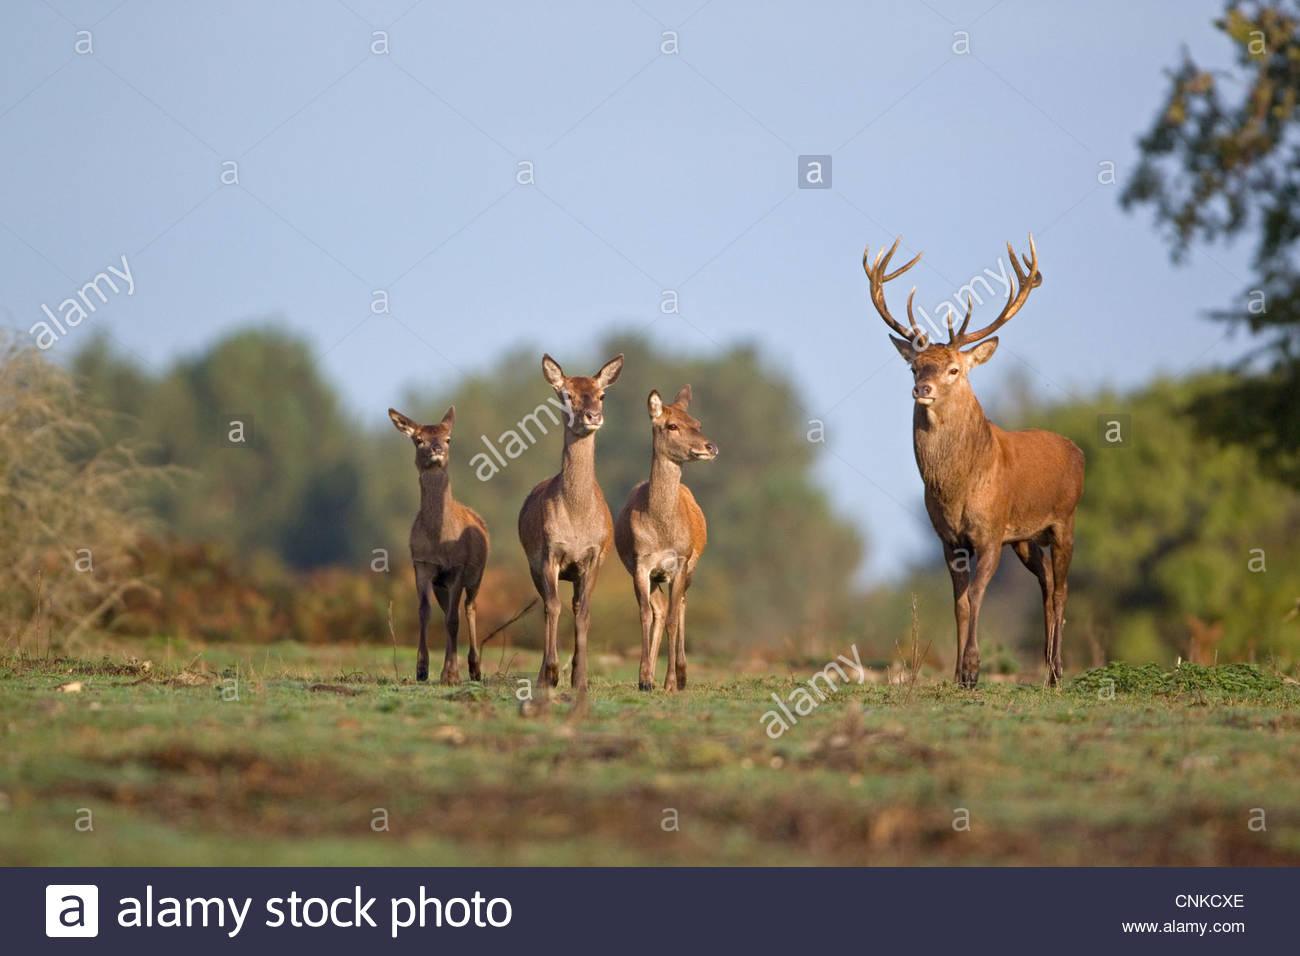 Red Deer Rut Minsmere High Resolution Stock Photography And inside Deer Rut Westleton 2021